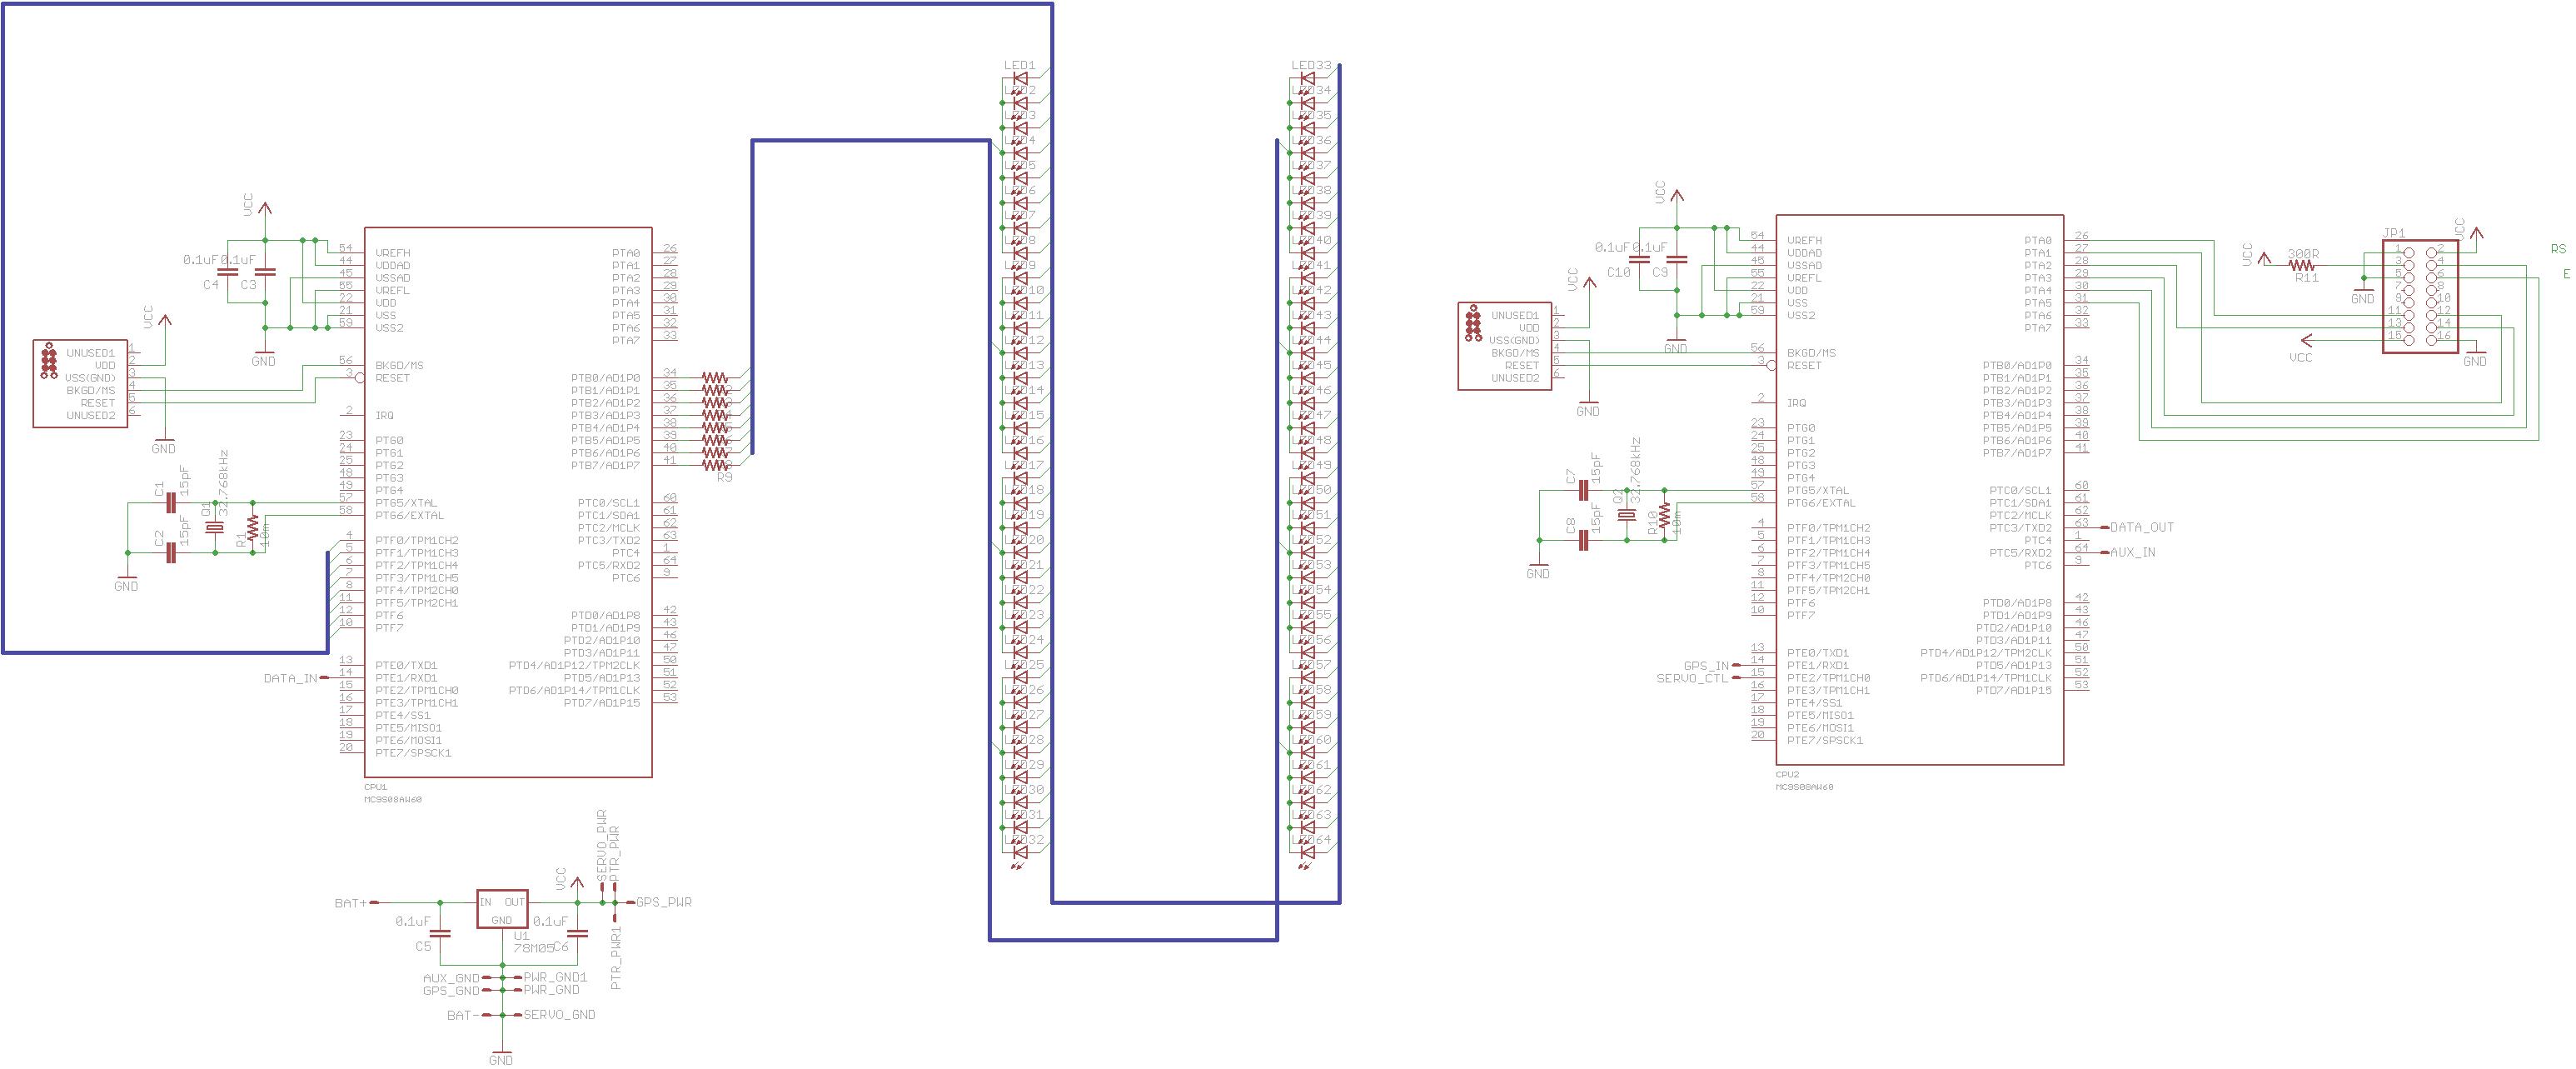 Fisher Plow Wiring Diagram Minute Mount 2 Wiring Diagrams Database – Fisher Minute Mount Plow Wiring Diagram